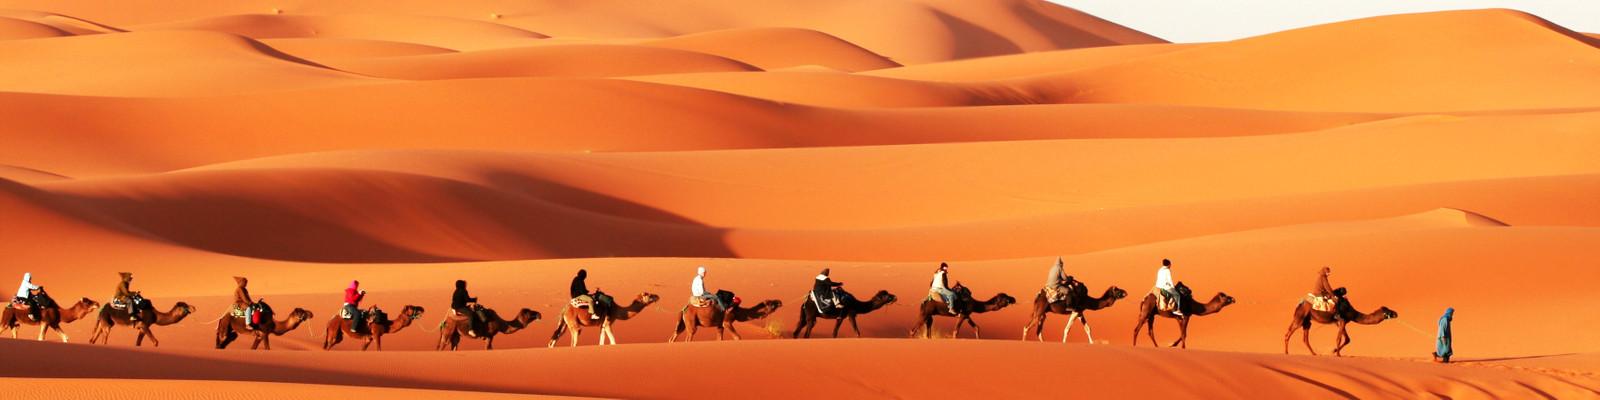 Individuelle Afrikareisen & Afrikaurlaub